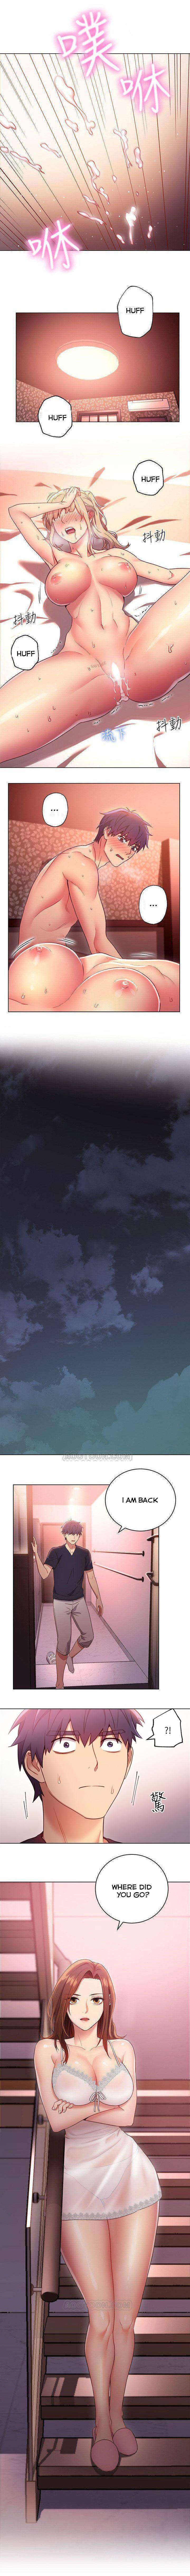 [Neck Pilllow] Stepmother Friends Ch.40/? [English] [Hentai Universe] NEW! 22/10/2020 131